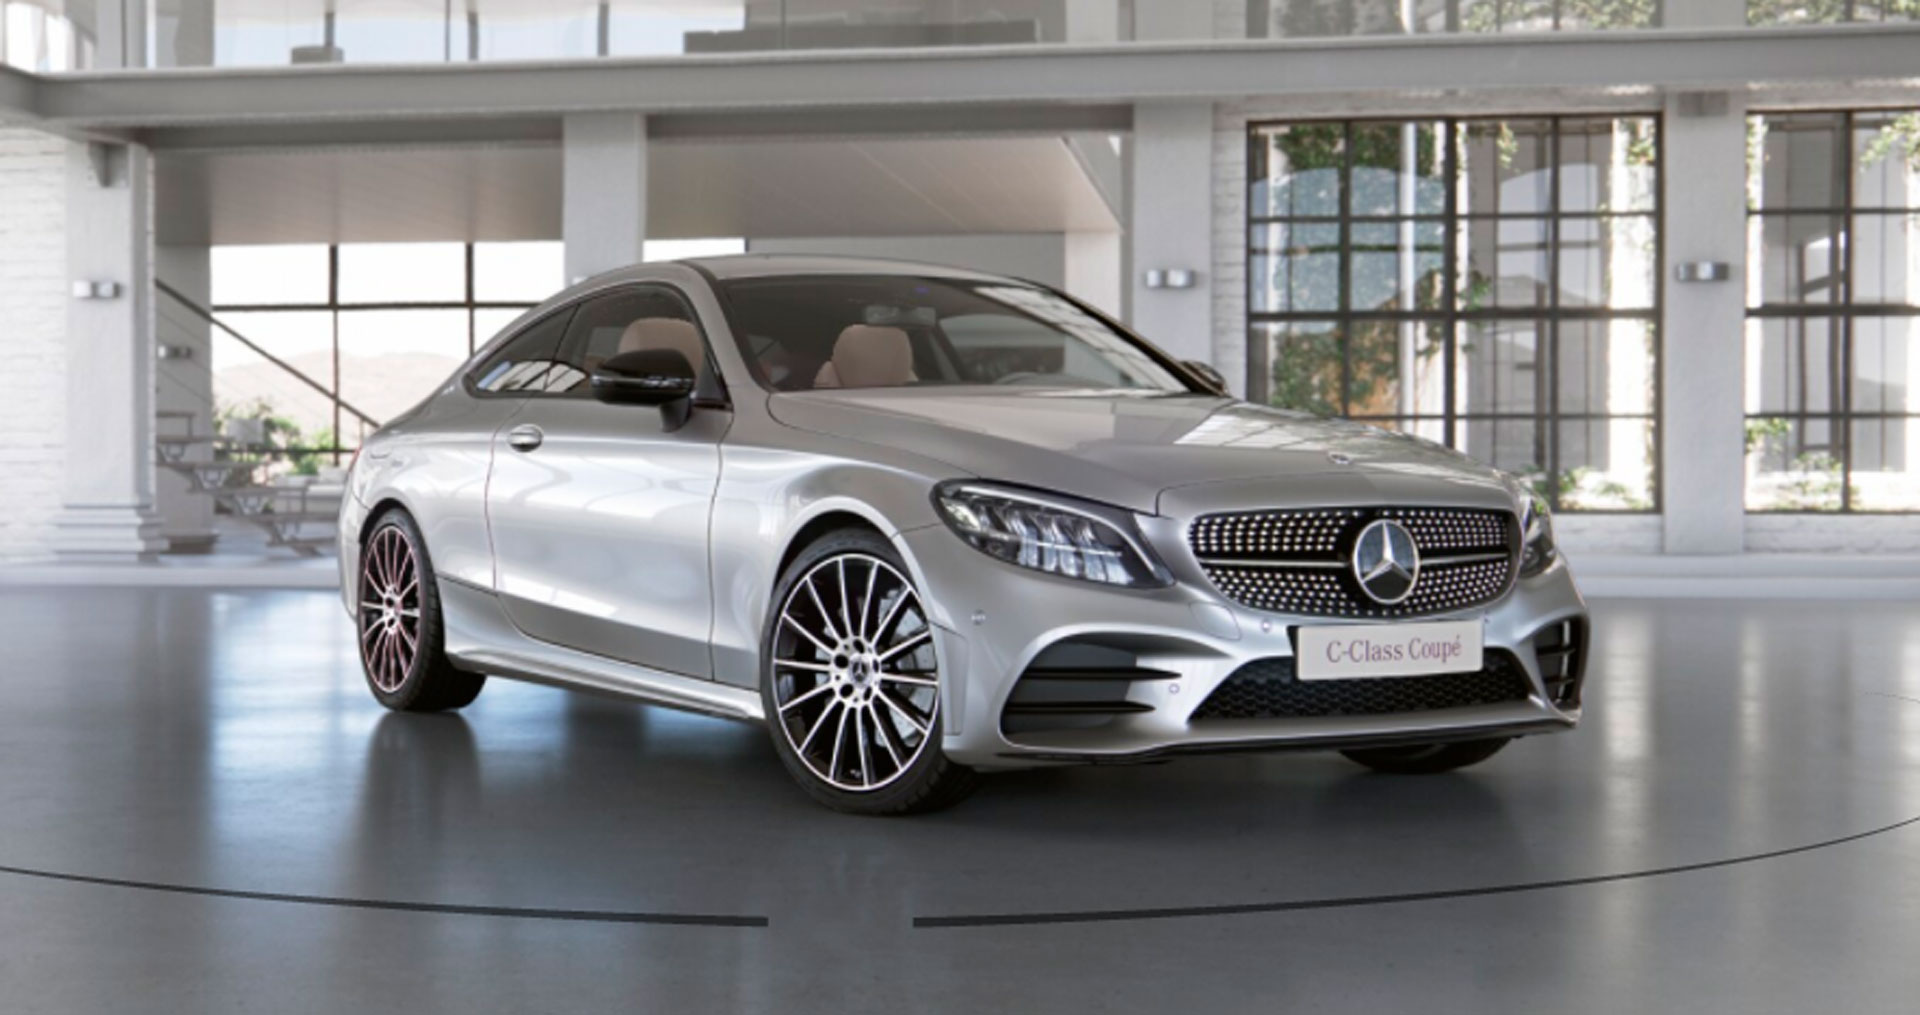 Mercedes-Benz C-Class Coupe 0152600181